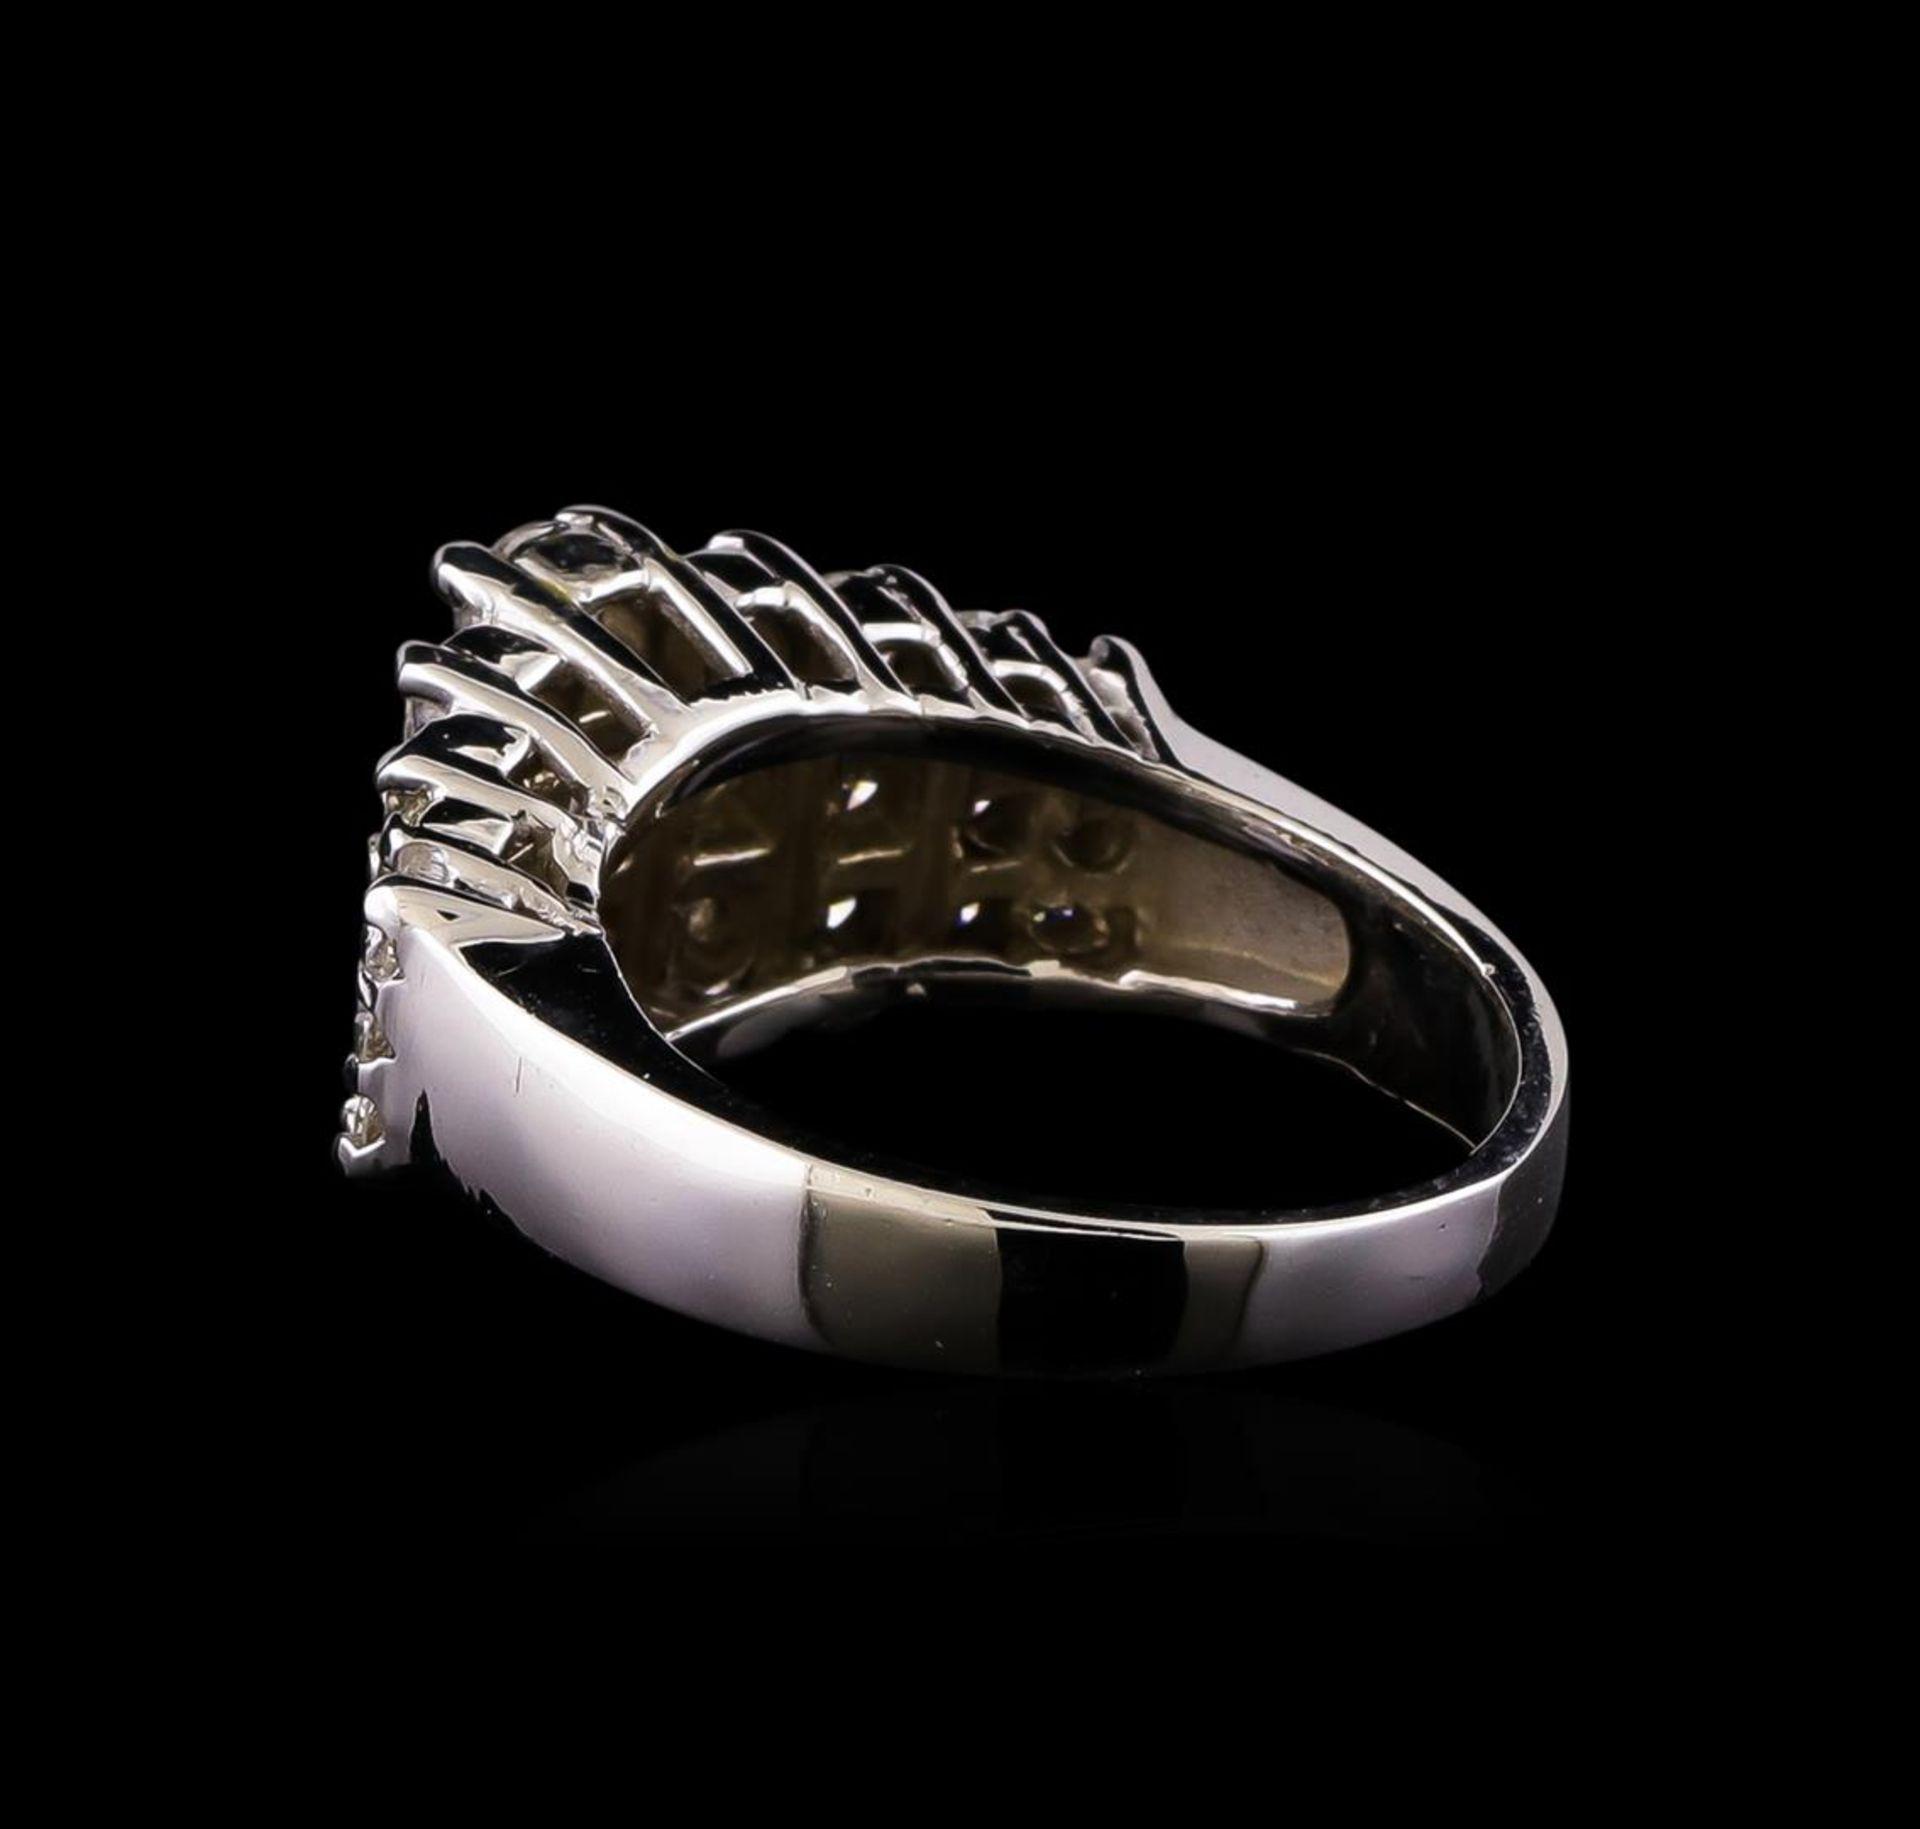 14KT White Gold 1.00 ctw Diamond Ring - Image 3 of 5